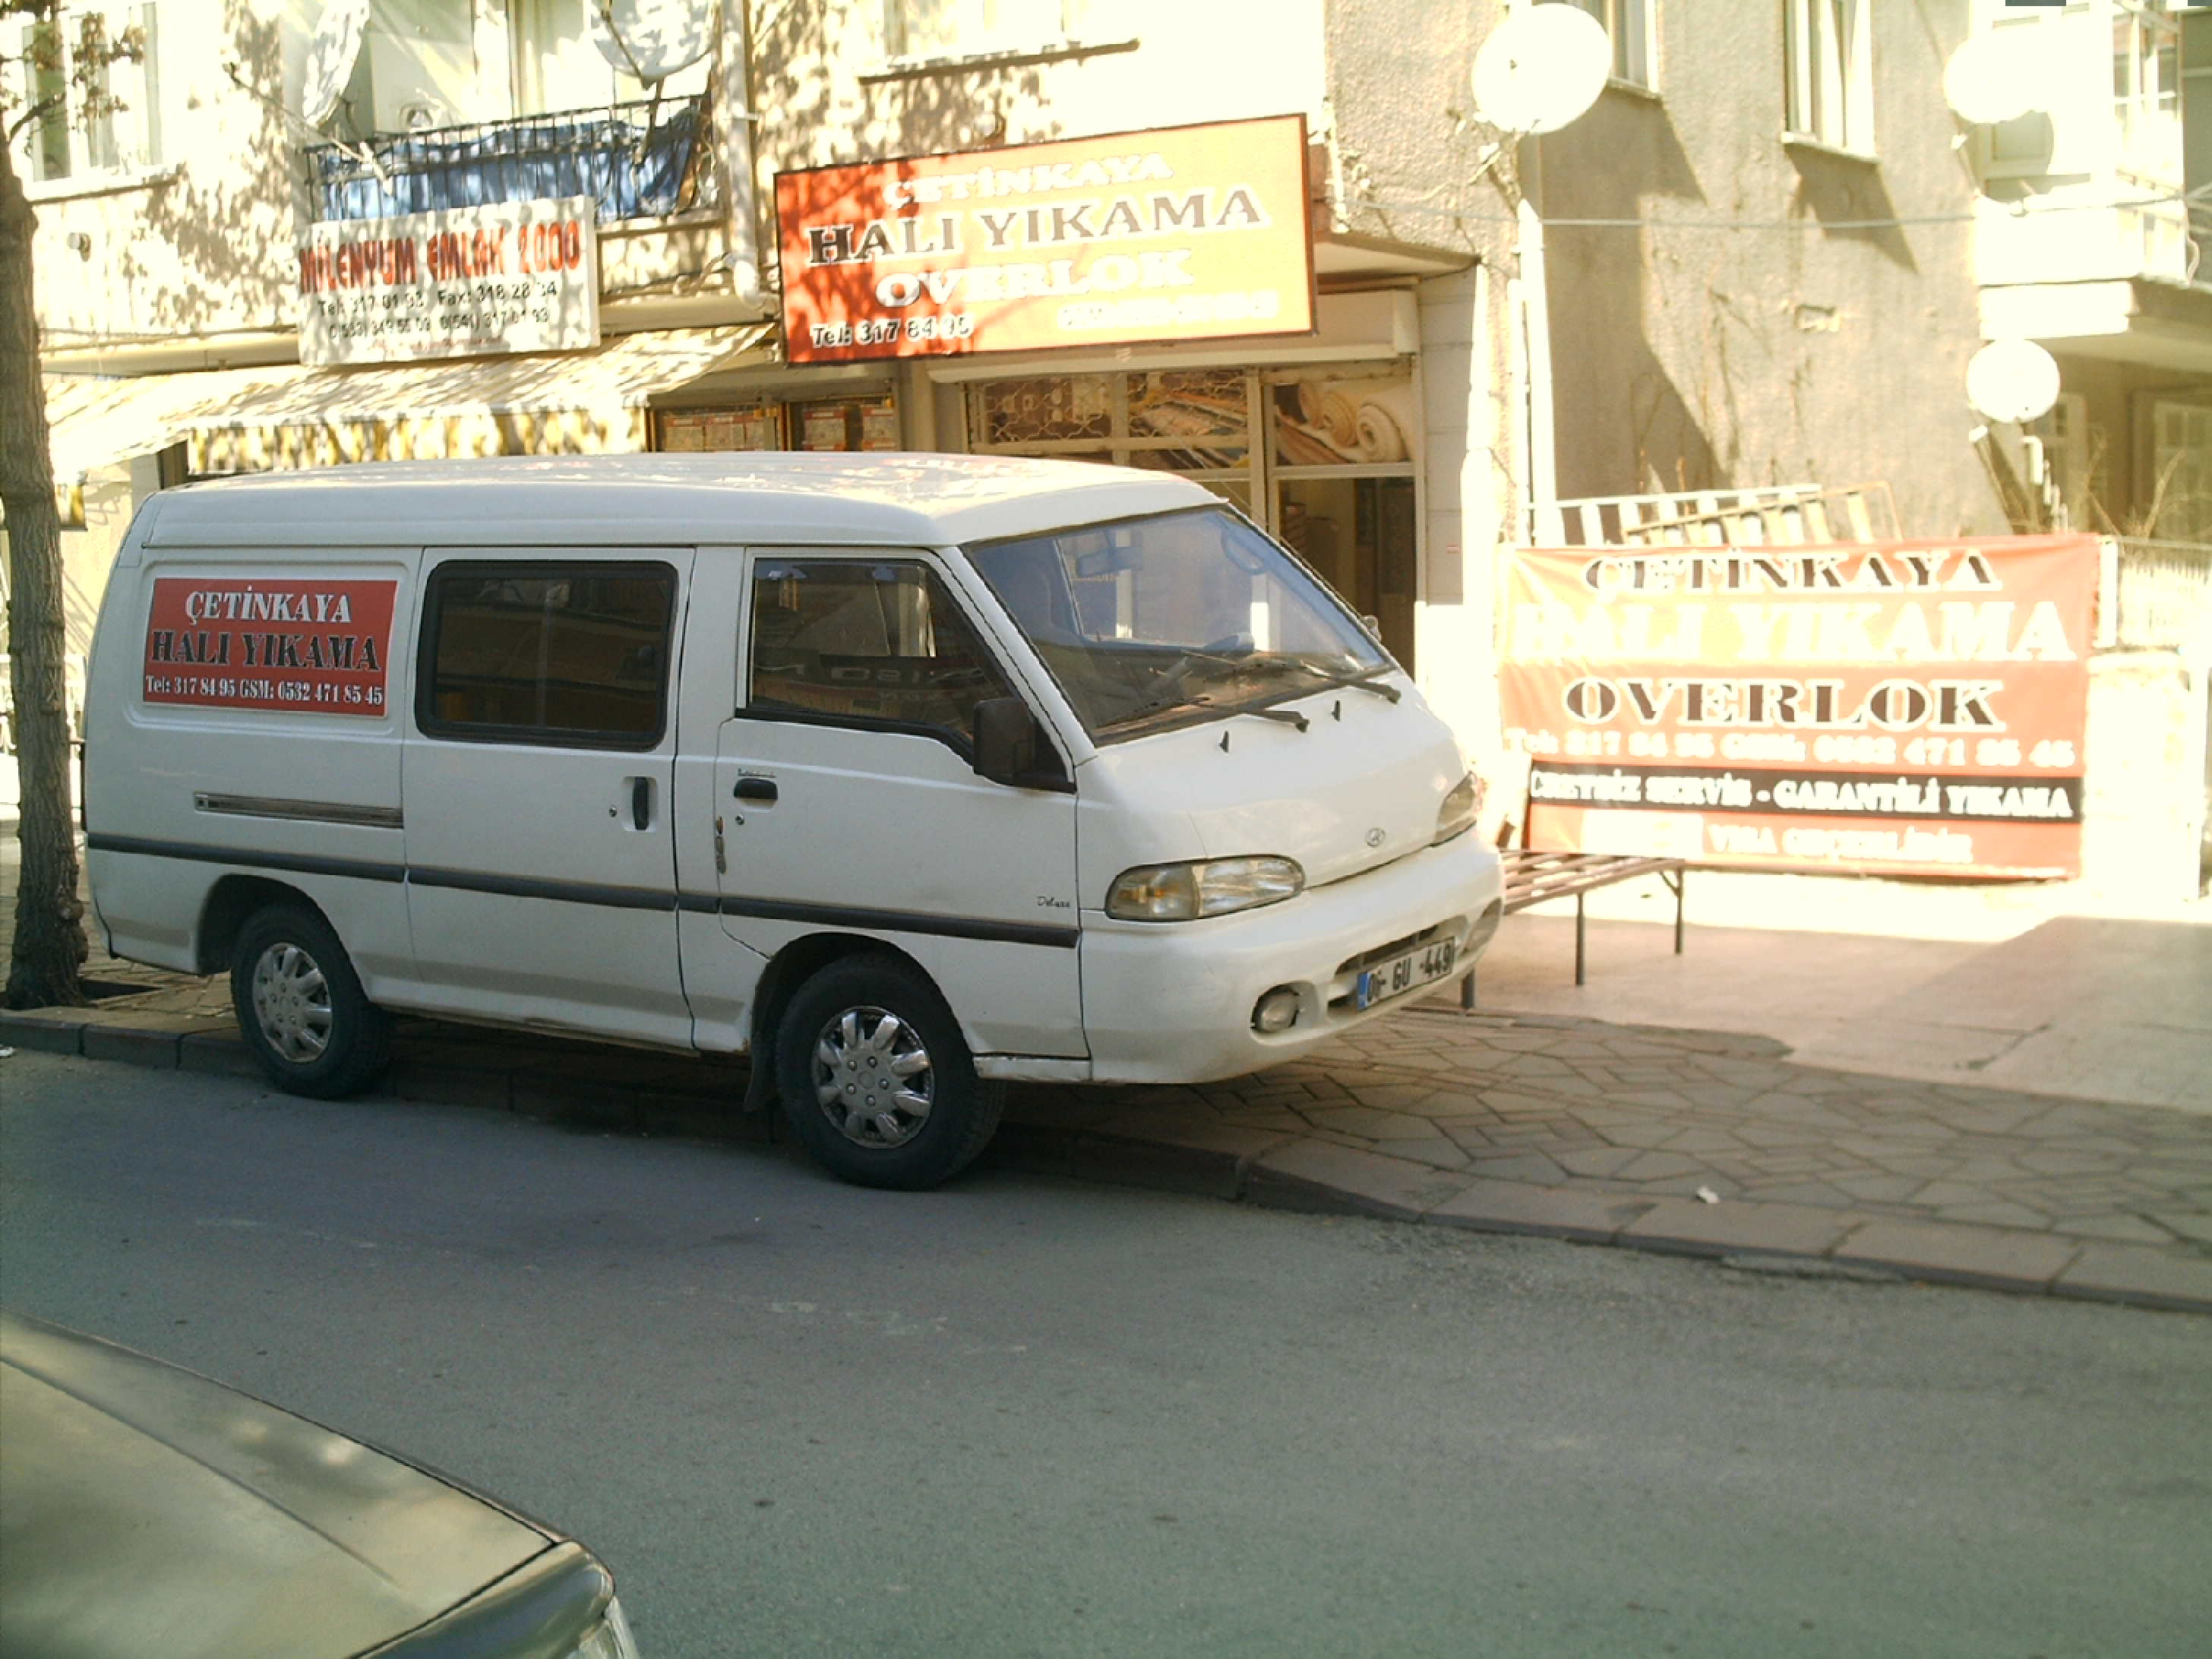 yaşamkent_hali_yikama_servis